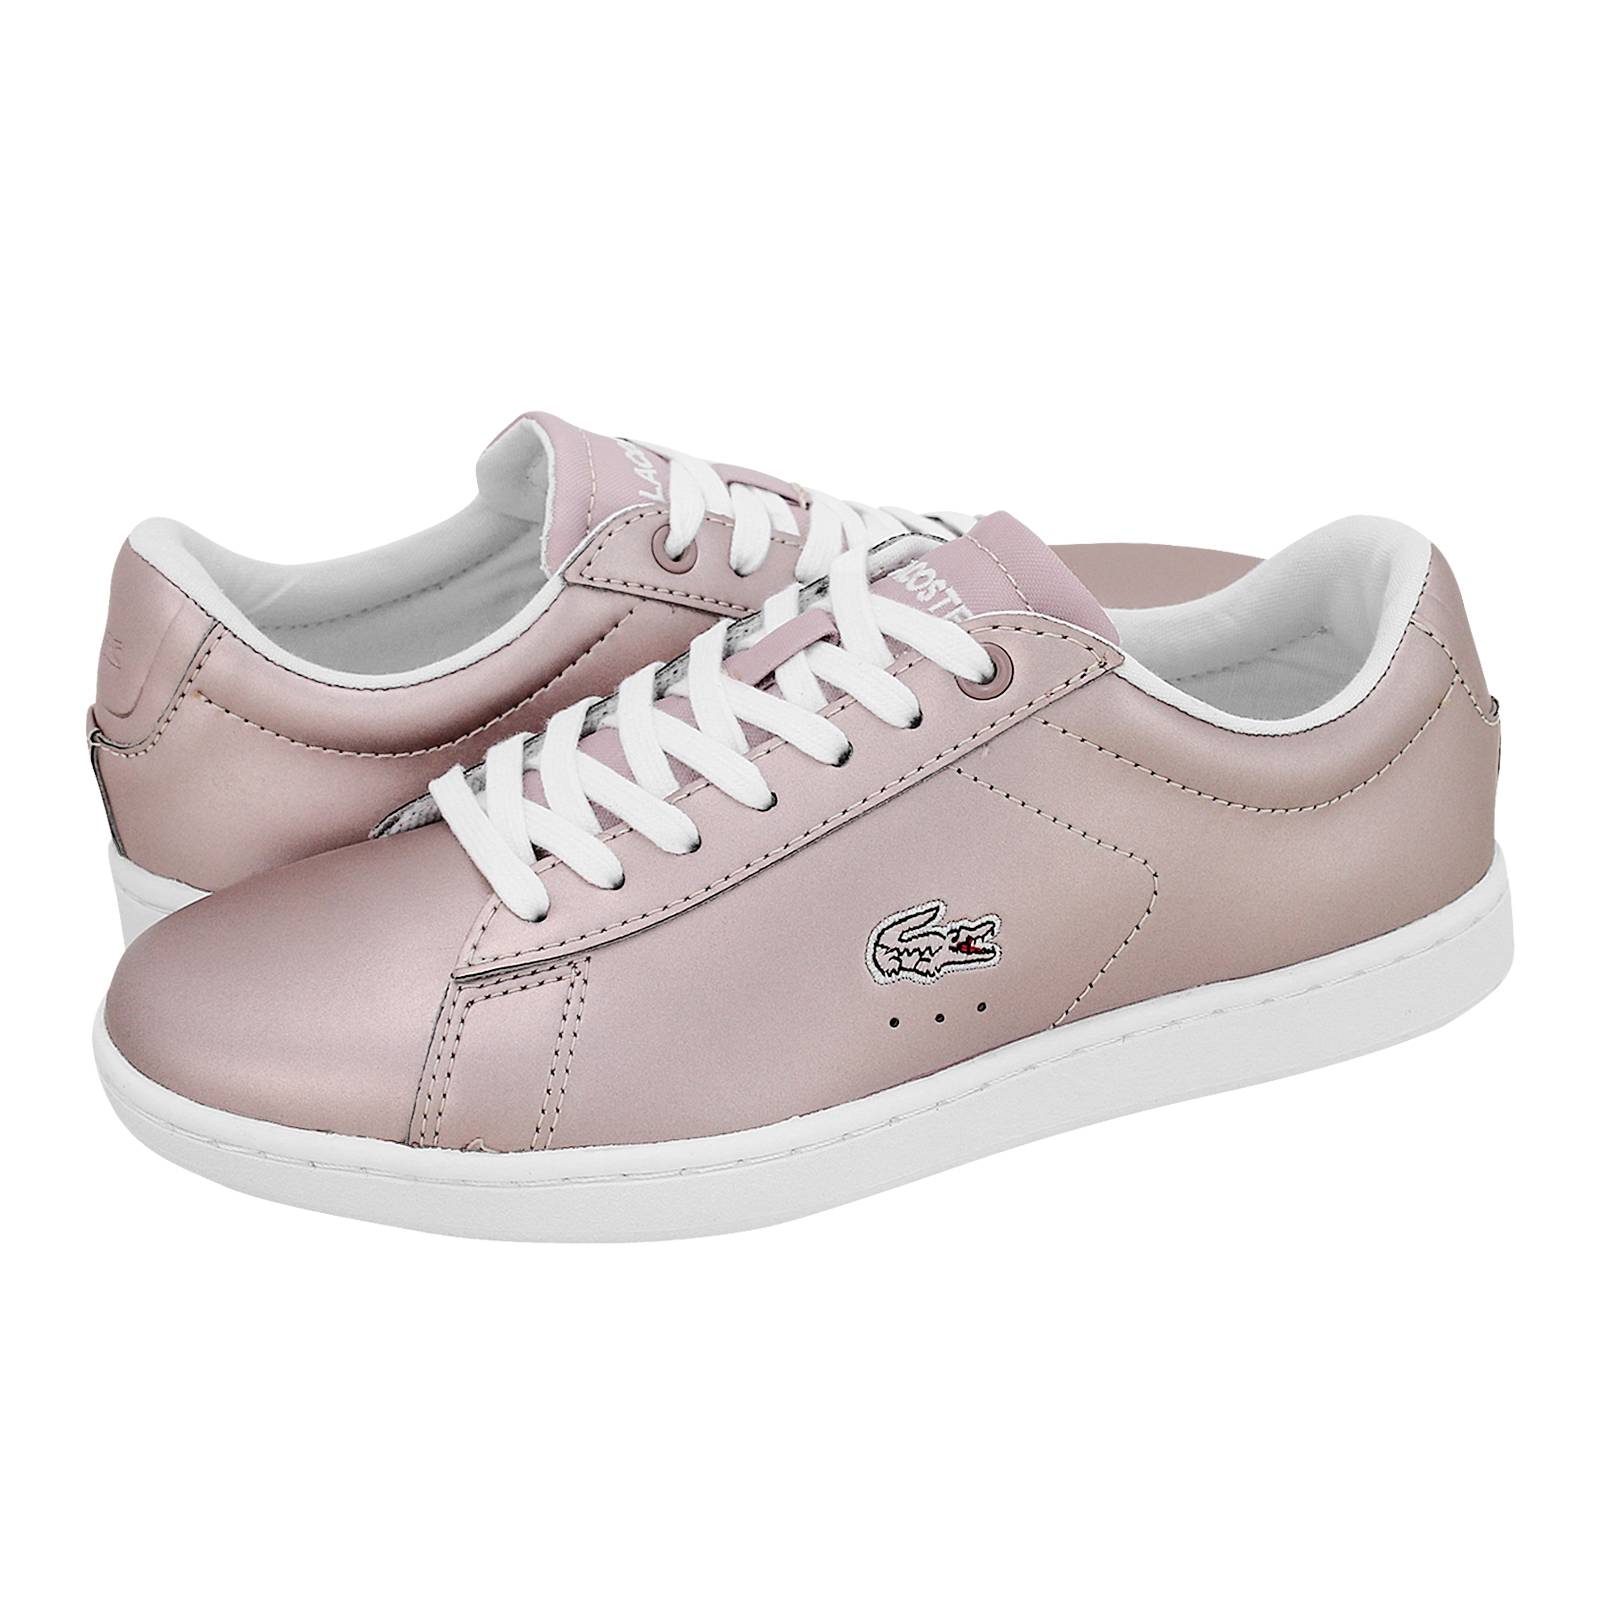 Carnaby EVO - Γυναικεία παπούτσια casual Lacoste από δέρμα - Gianna ... 418649fccf5